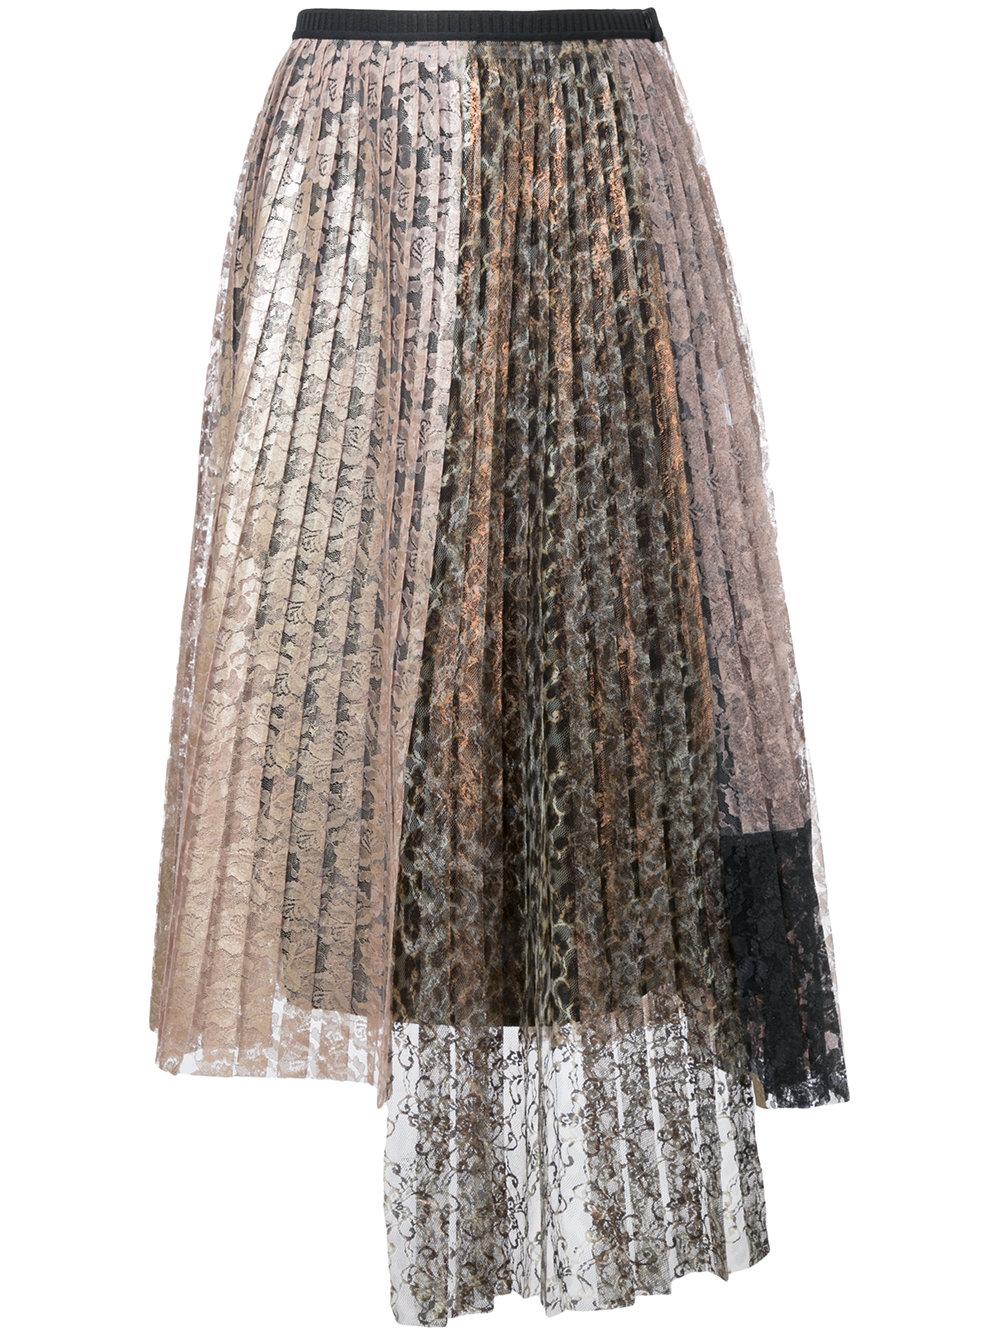 ANTONIO MARRAS lace pleated skirt, FarFetch.com